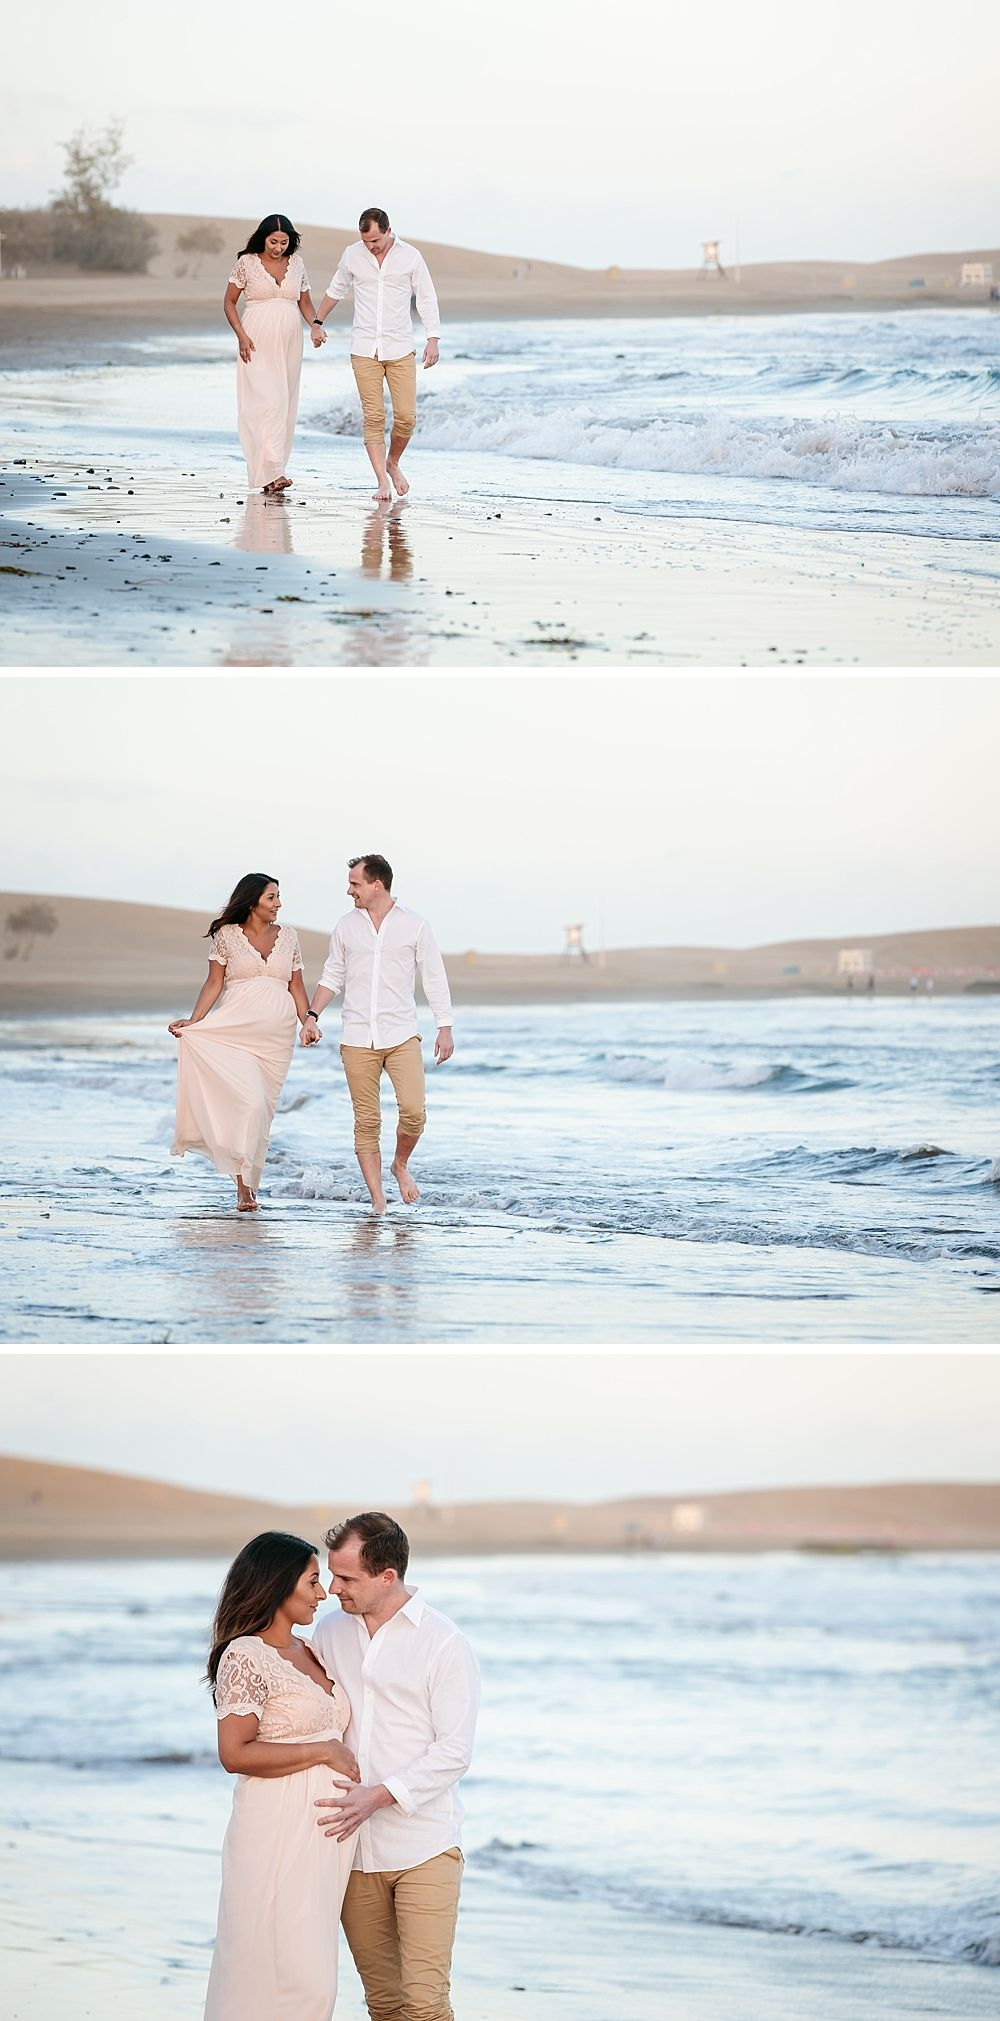 118-mette-brandt-photography-8602_Maspalomas-beach